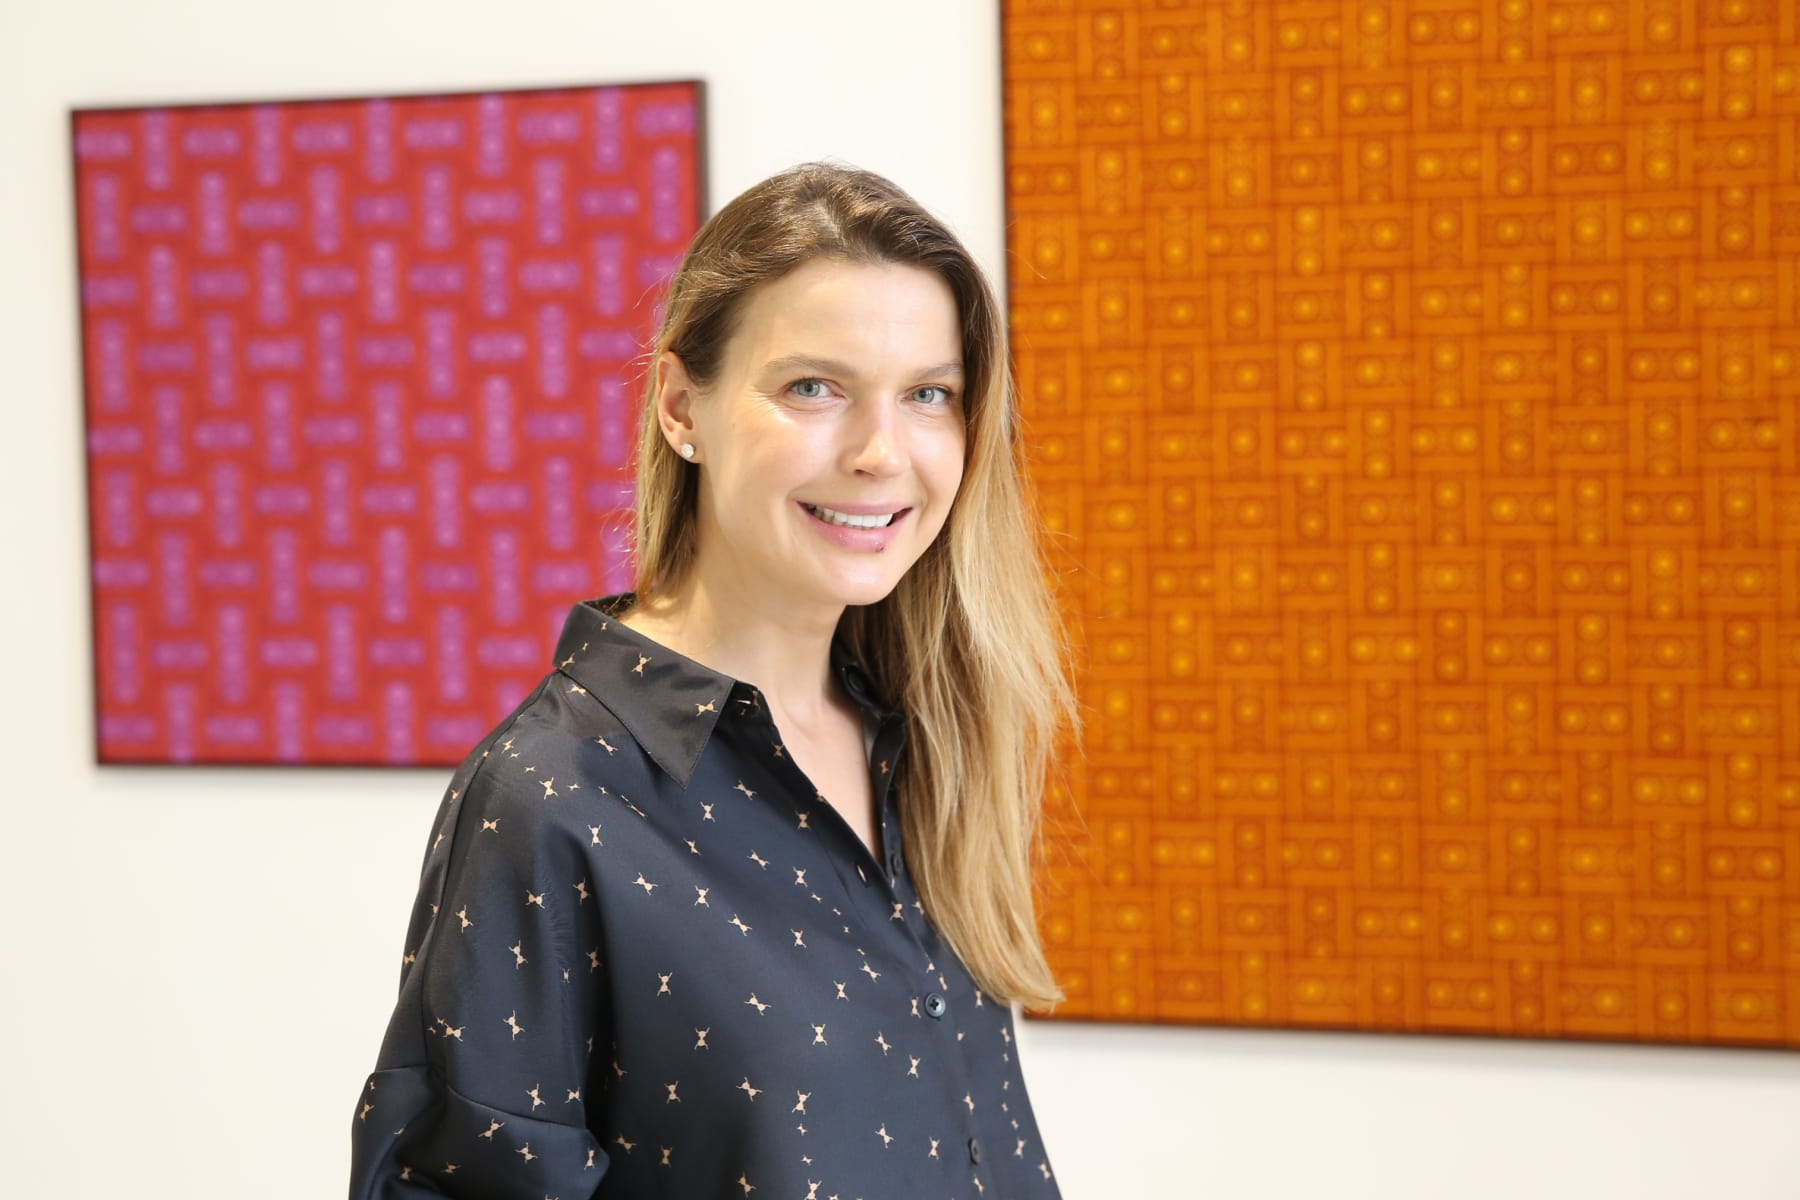 Galerija Vartai, 2019 Indrė Šerpytytė at the opening of her solo exhibition